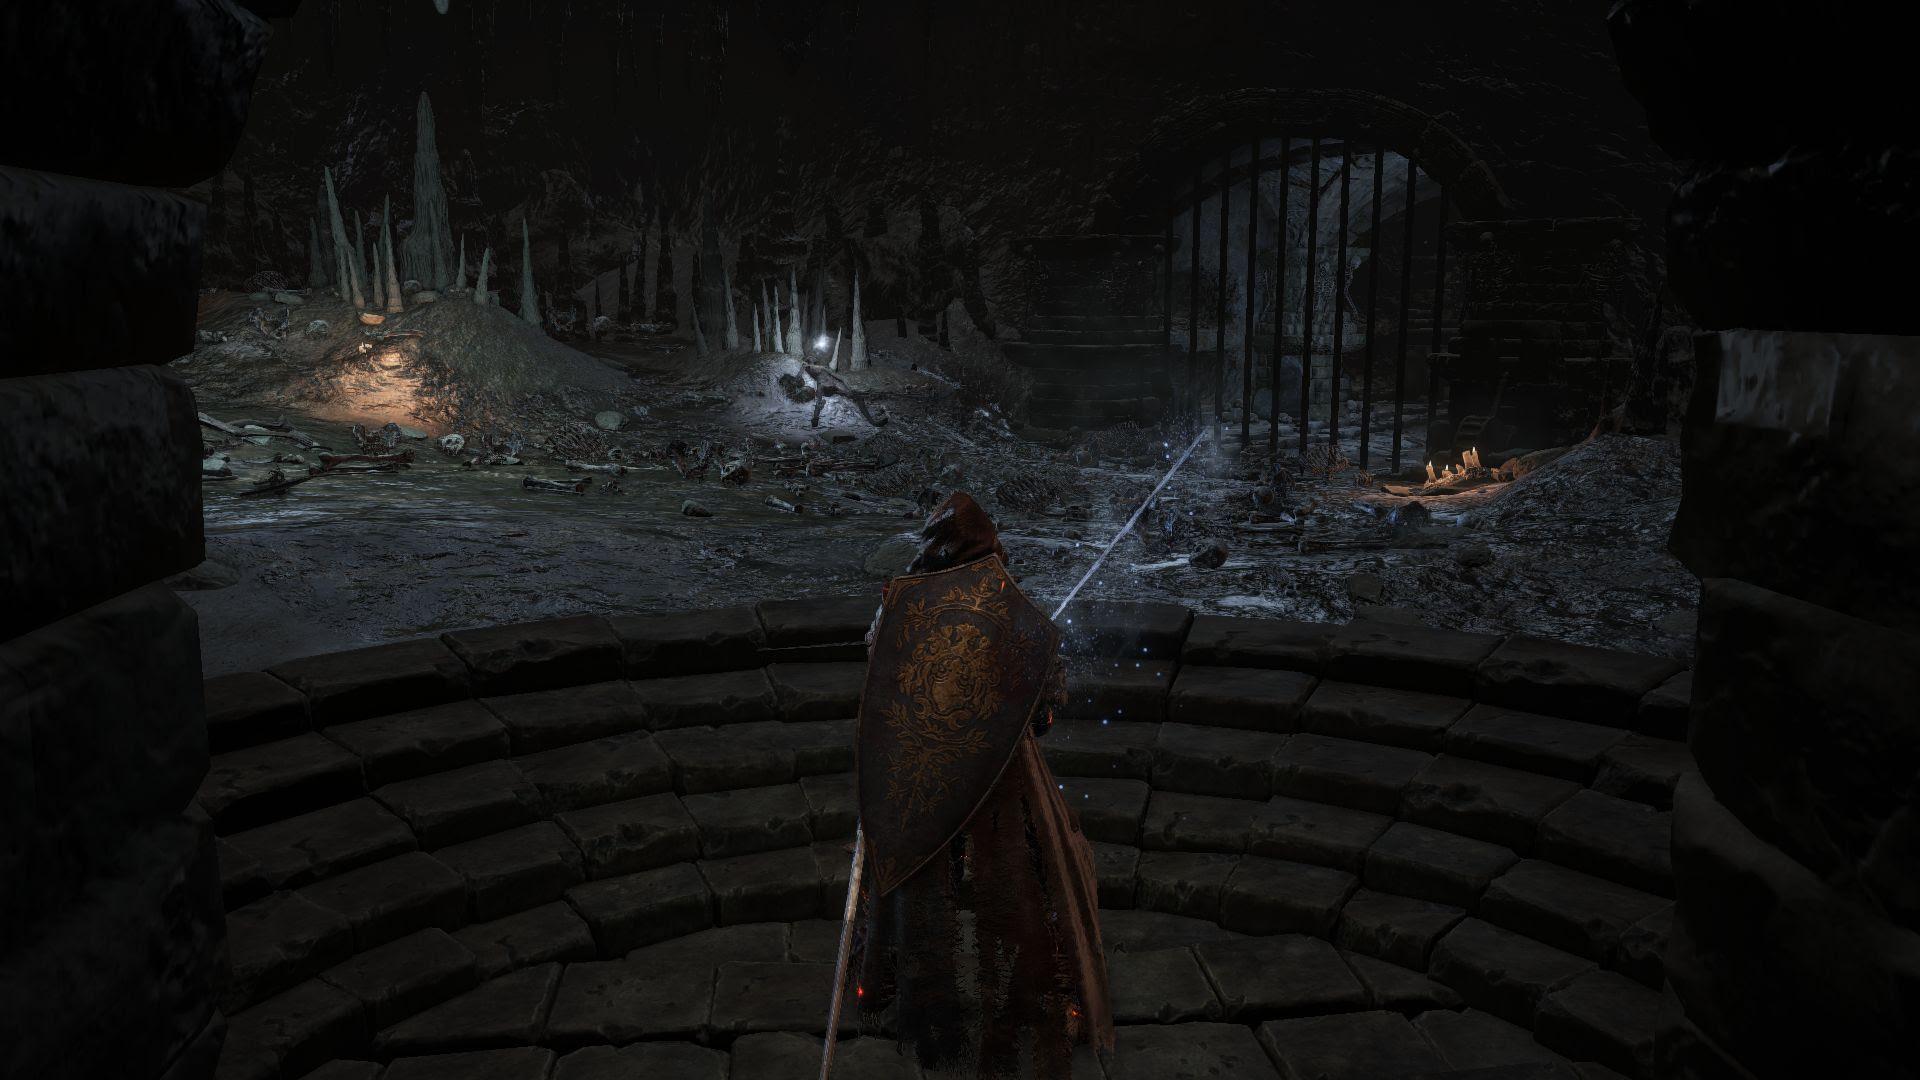 CCC: Dark Souls III Guide/Walkthrough - Catacombs of Carthus